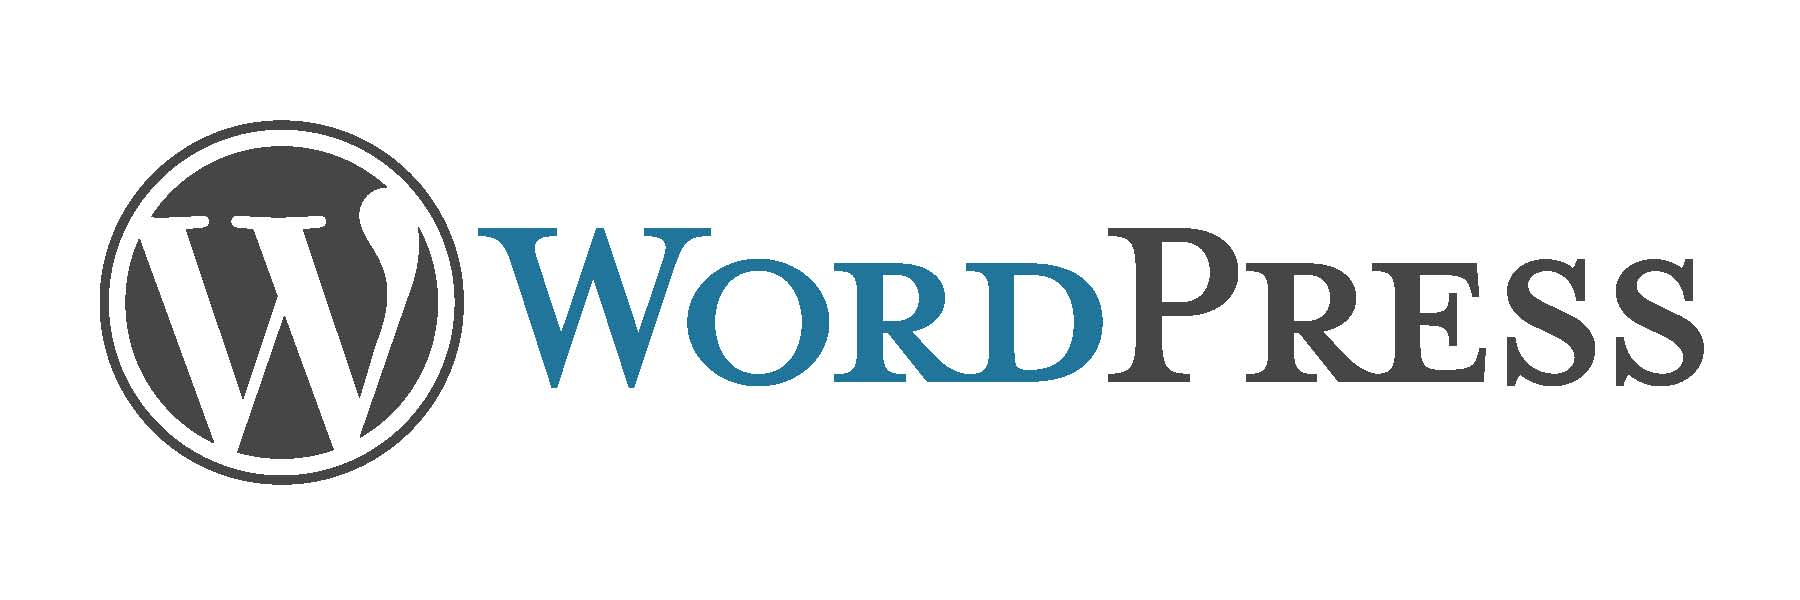 Obvious WordPress Tips: Bulk Edit For the Win!